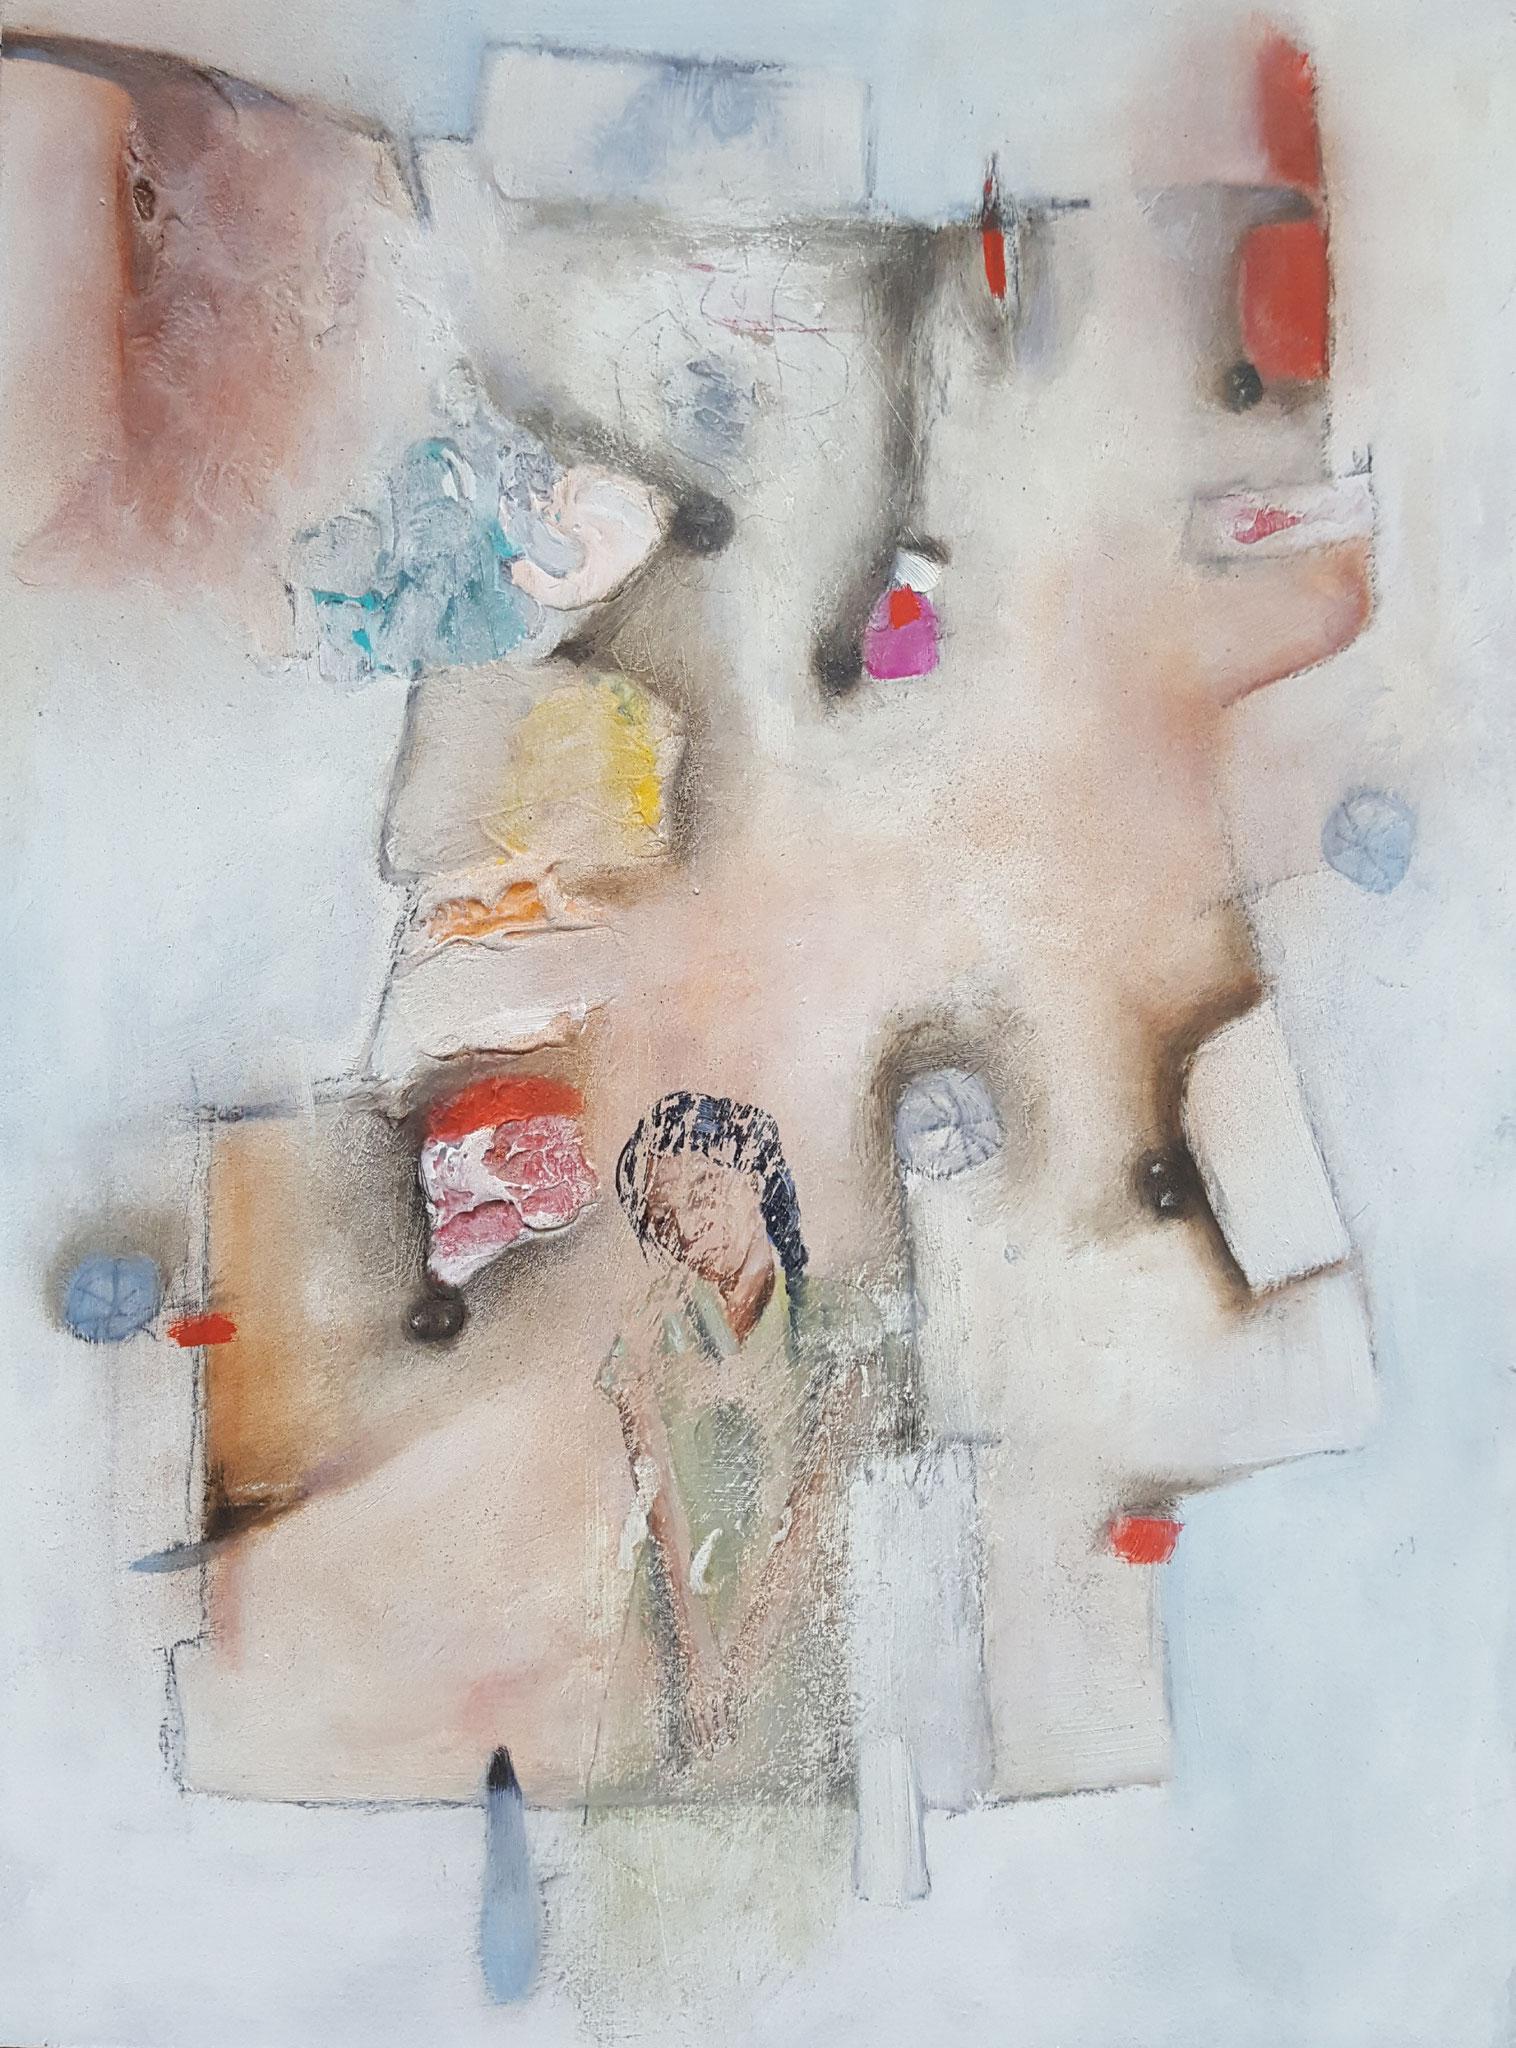 Des-aparecidos XI, 2018, 30 x 40 cm, Mixed media on canvas